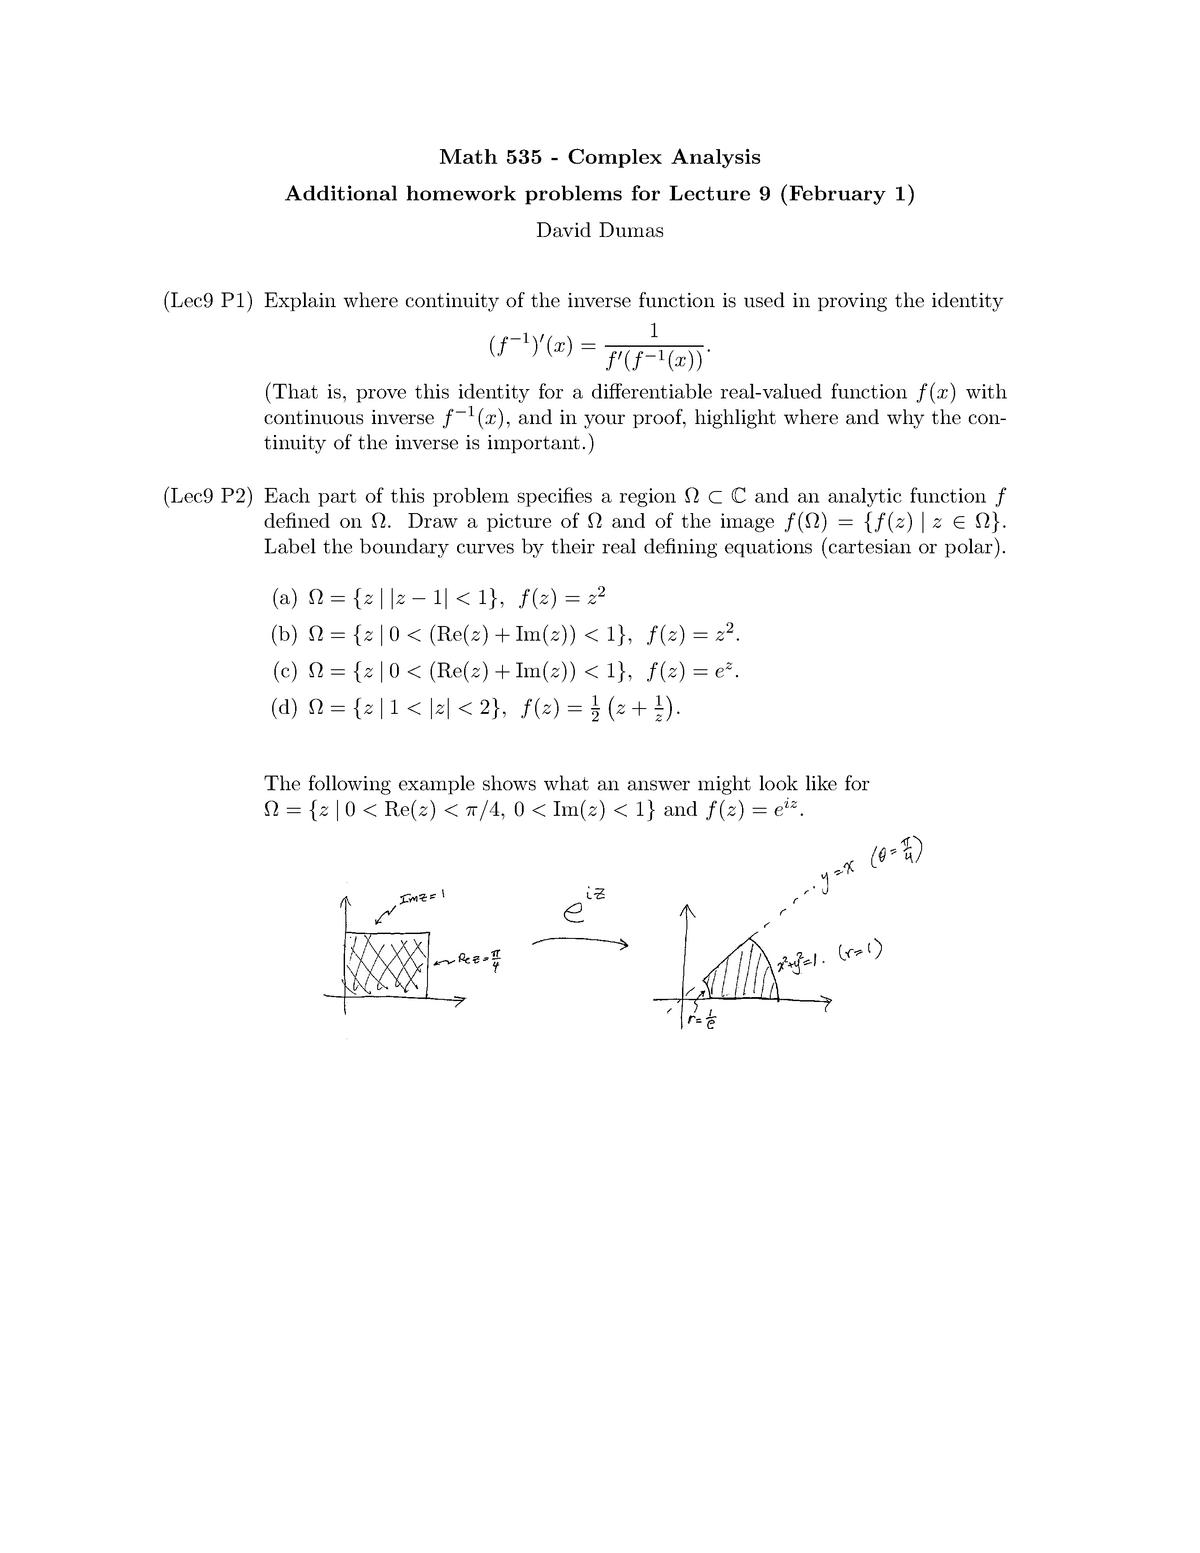 Math 535 - Complex Analysis HW lecture 9 - MATH 535: Complex